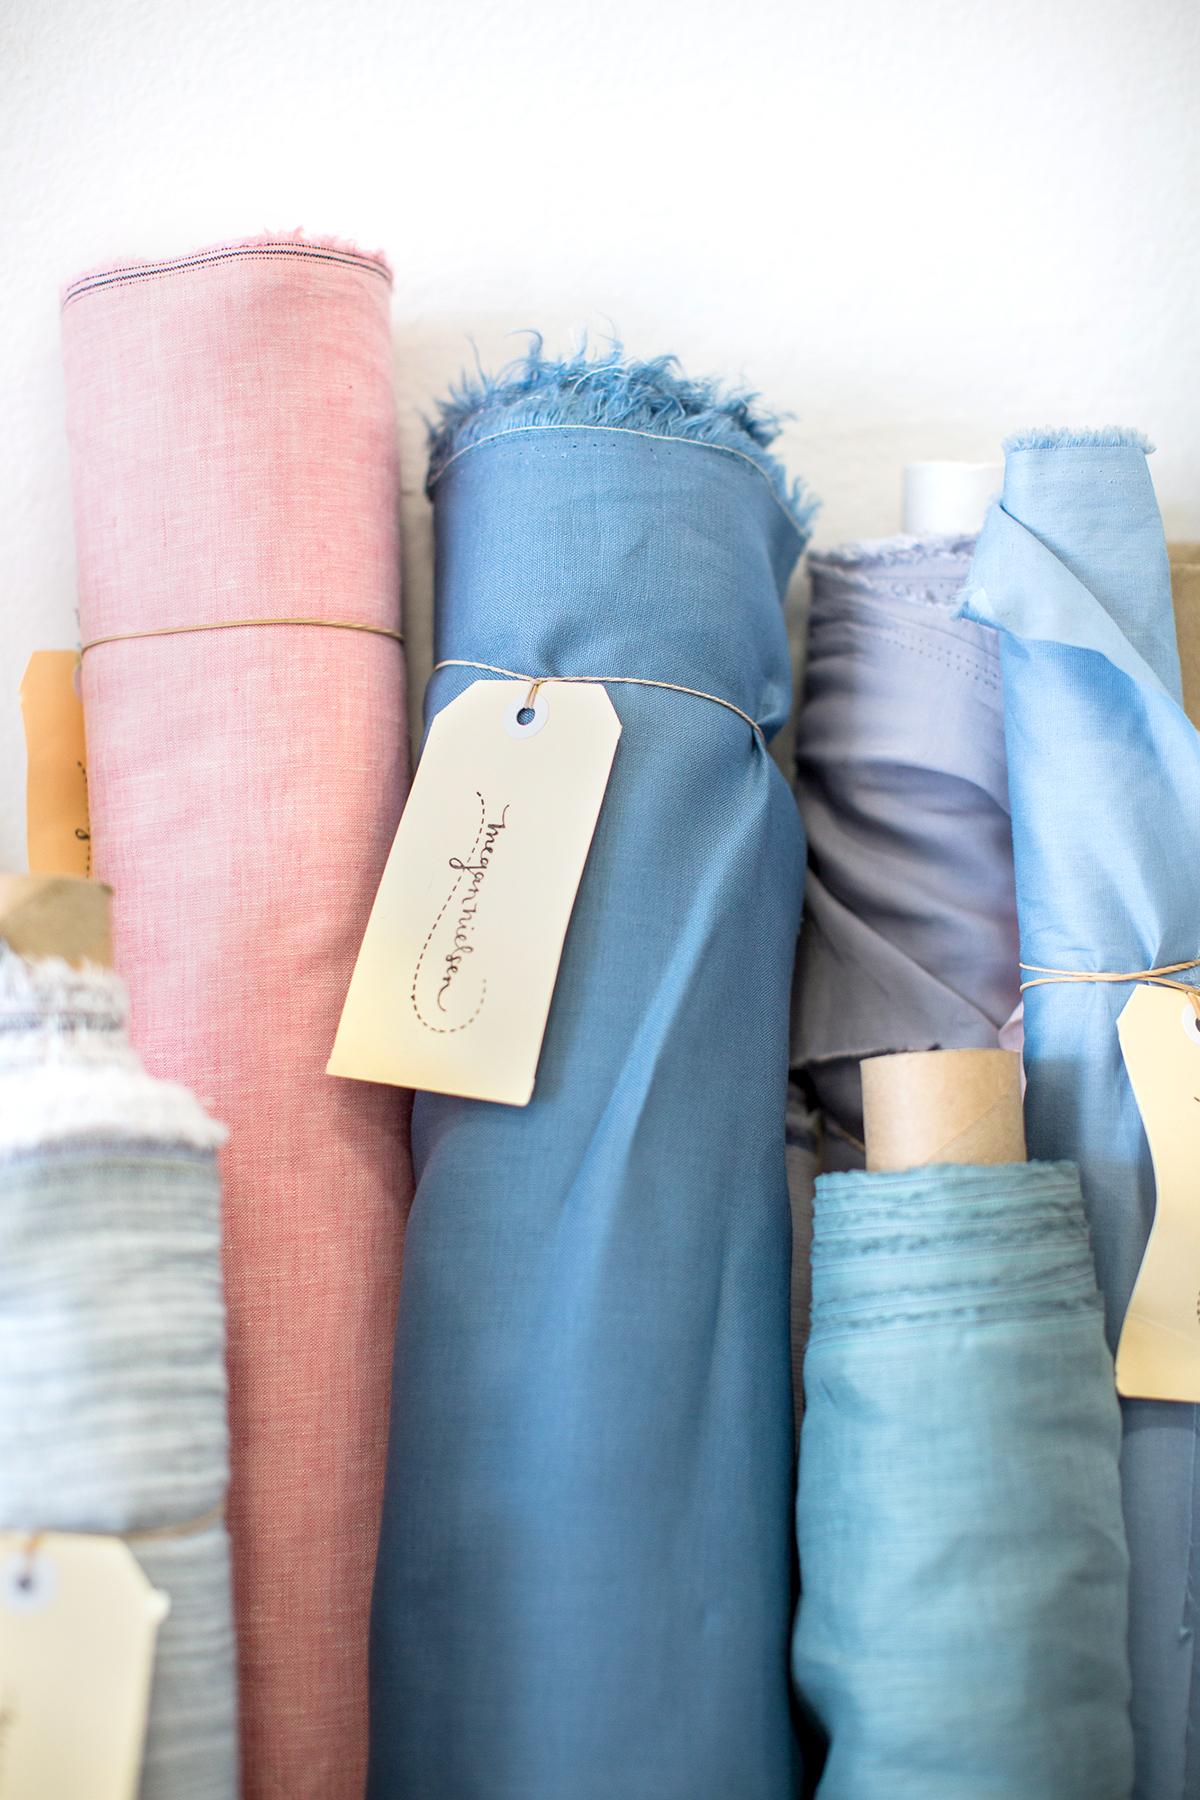 Megan Nielsen Patterns - Fabric In Our Studio